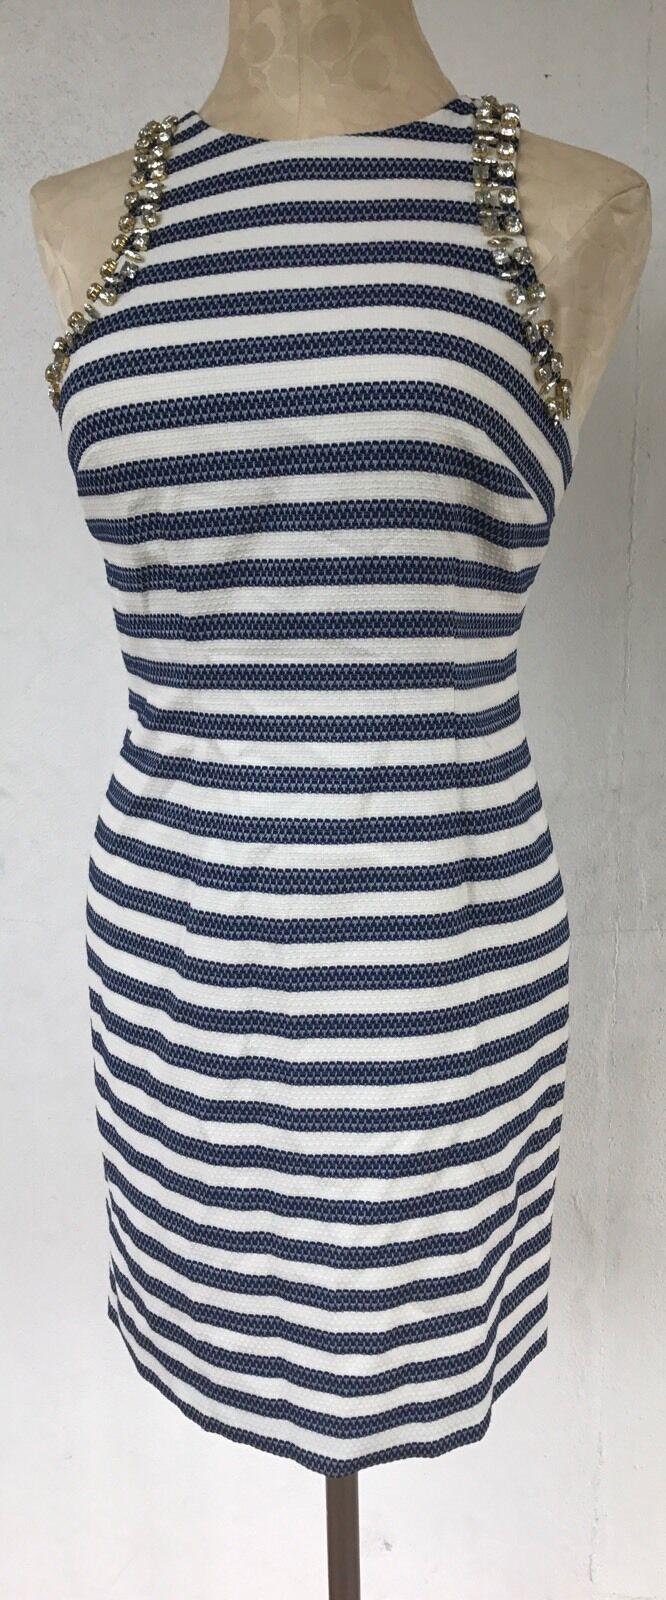 Trina Turk  Precioso Vestido Talla 4  nueva gama alta exclusiva